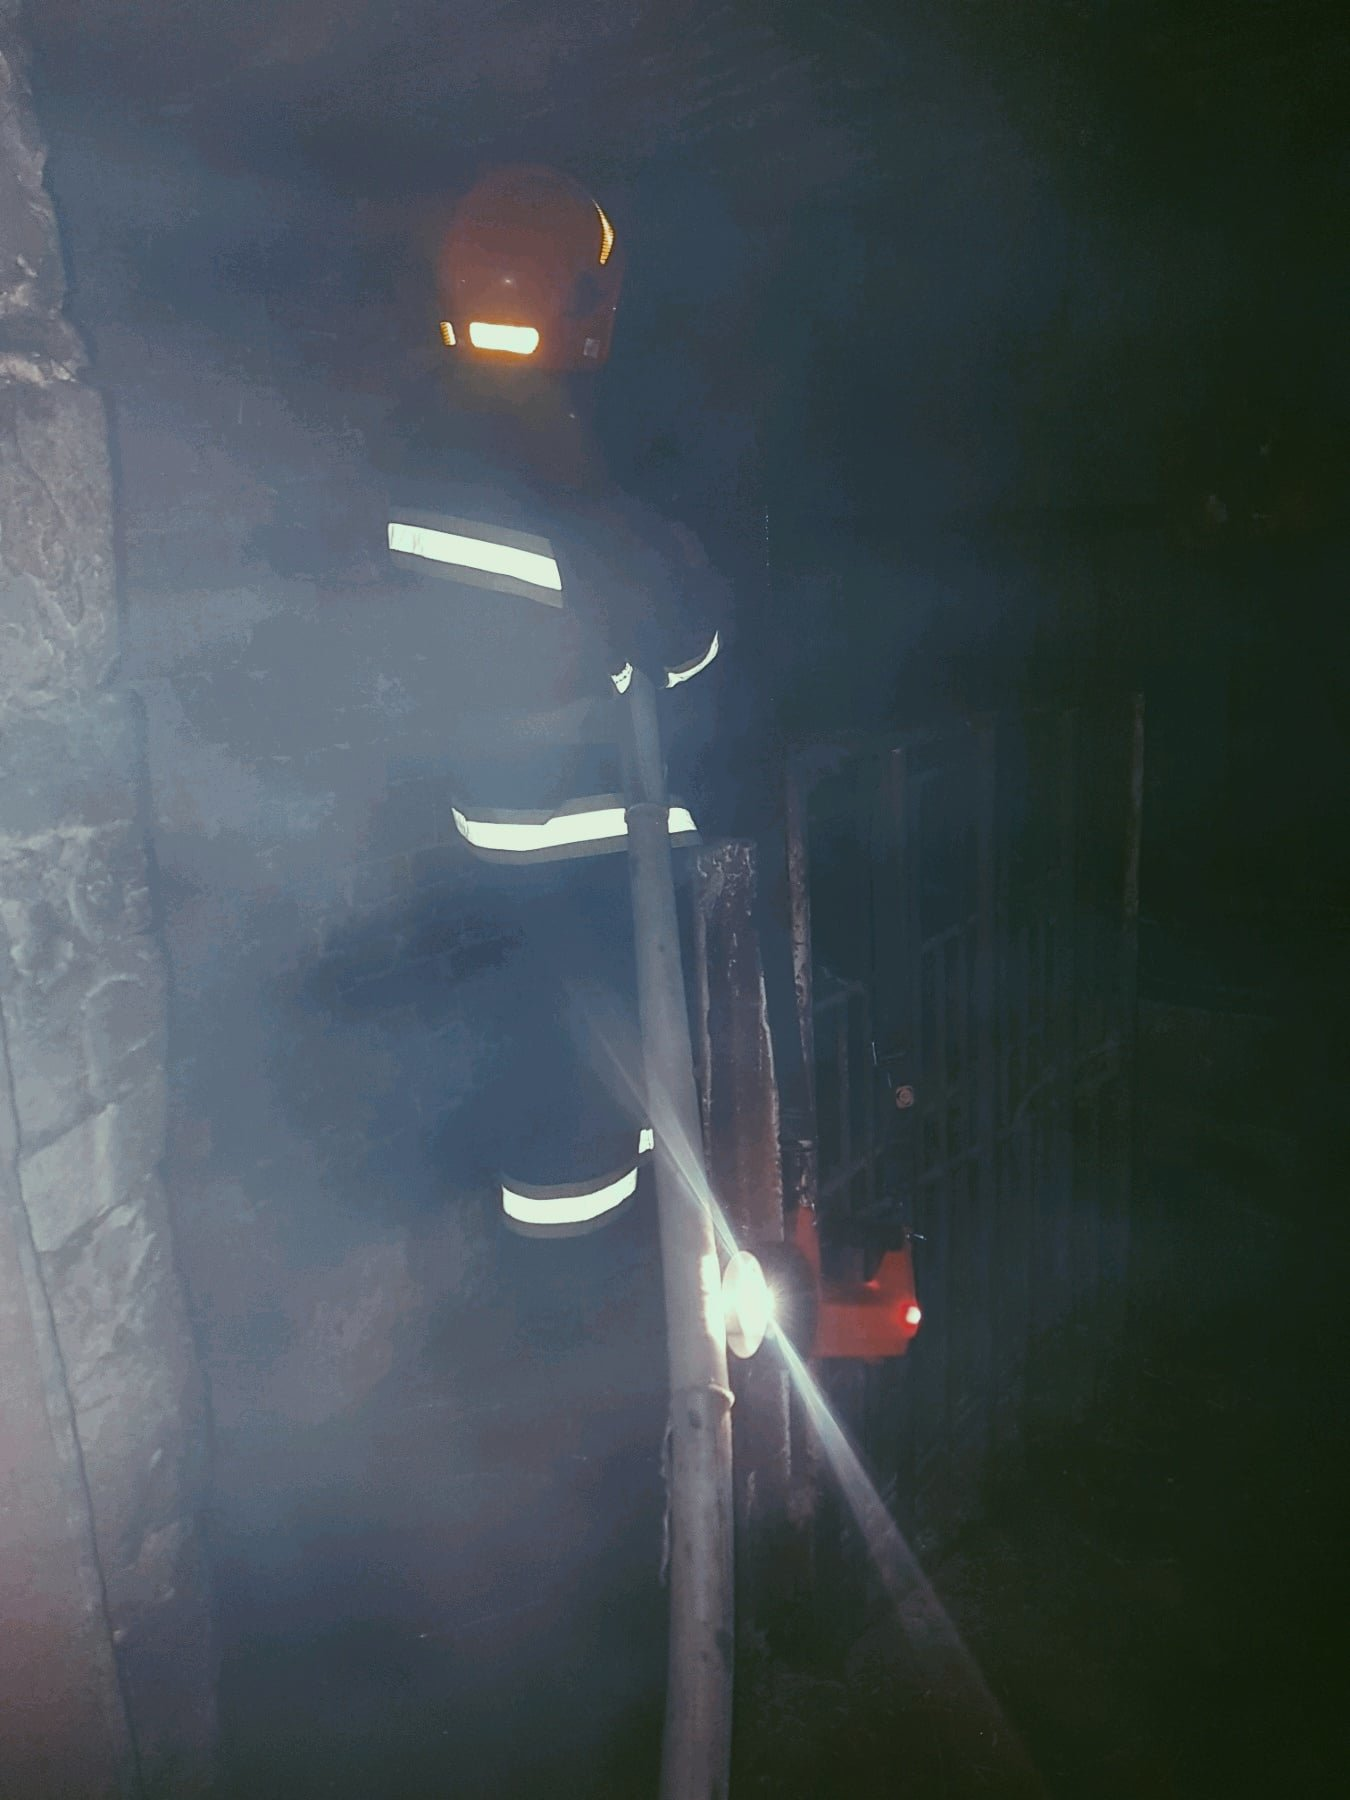 пожежа господарчої споруди